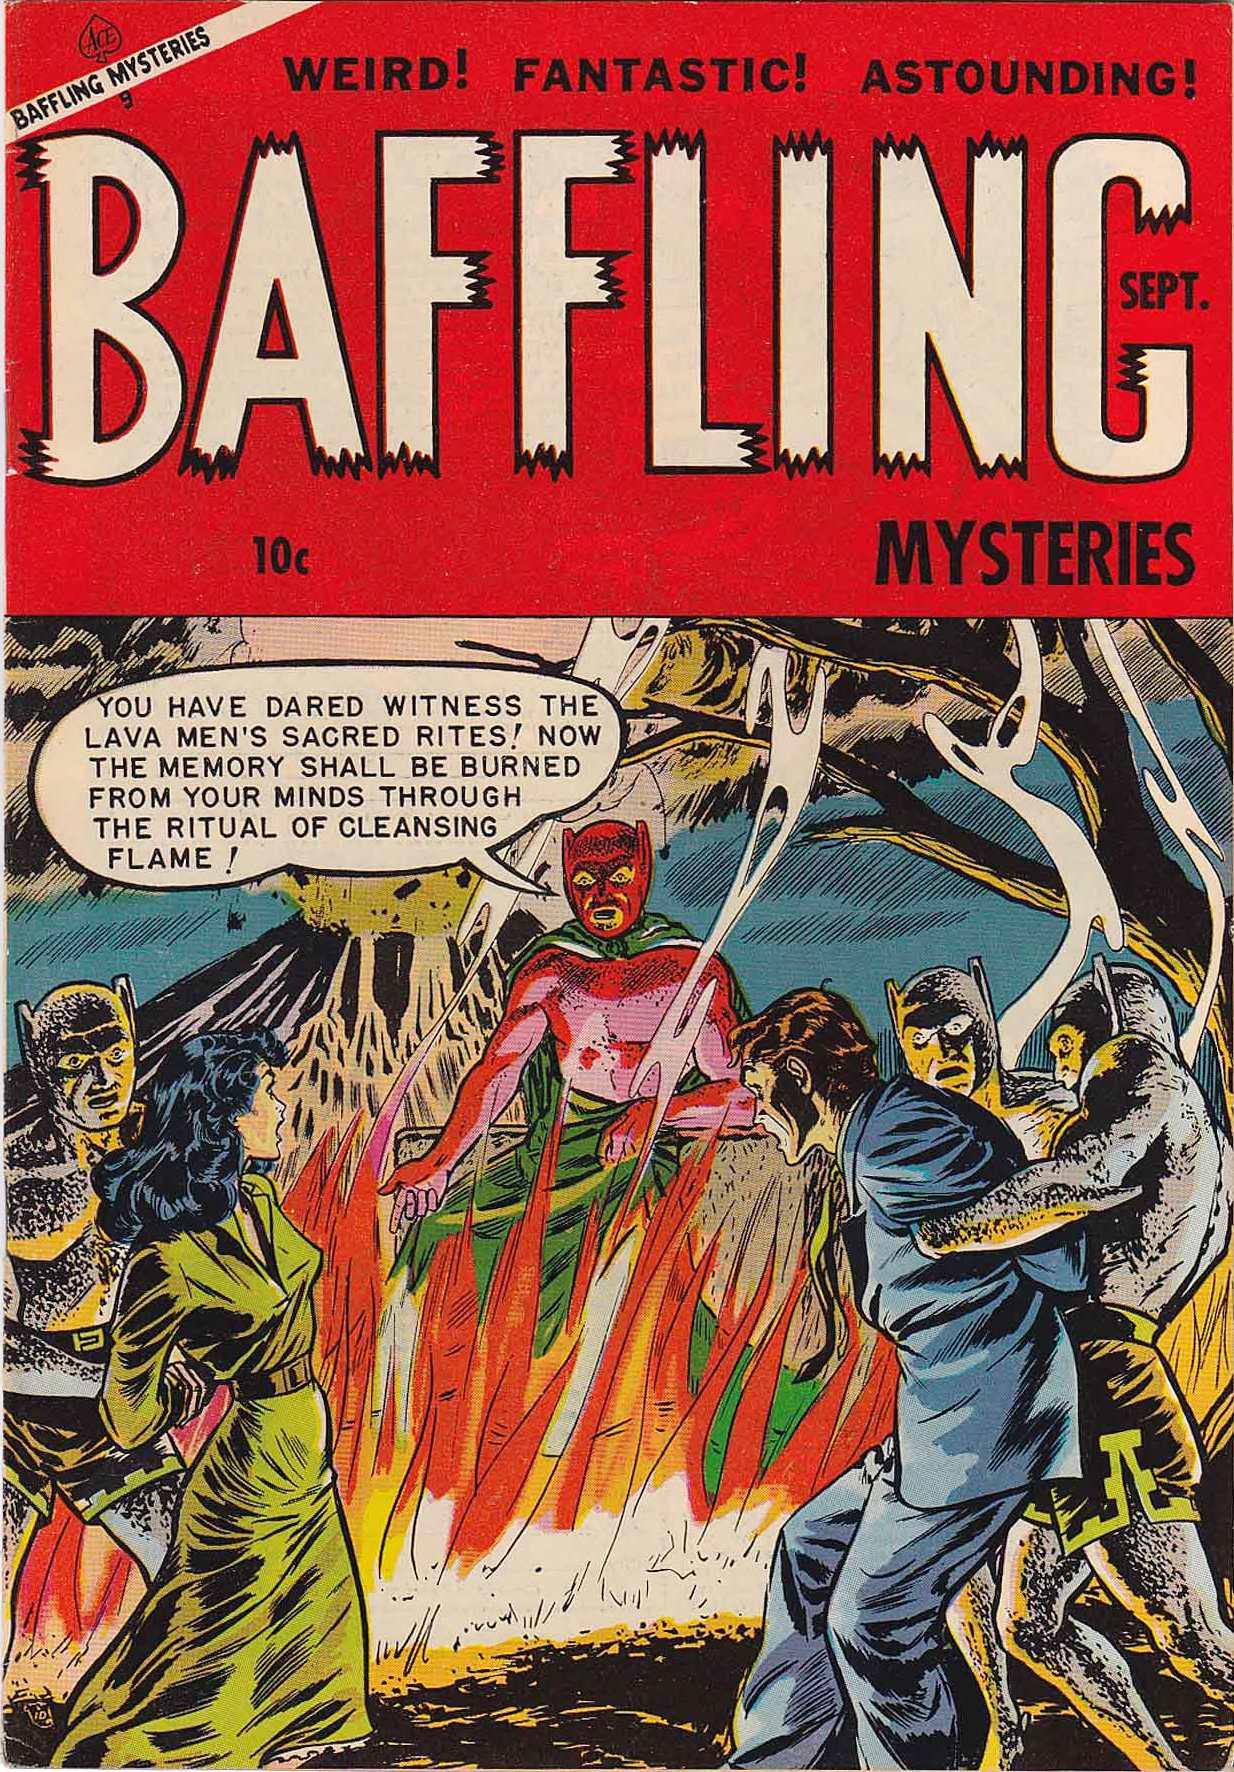 Baffling Mysteries Vol 1 17